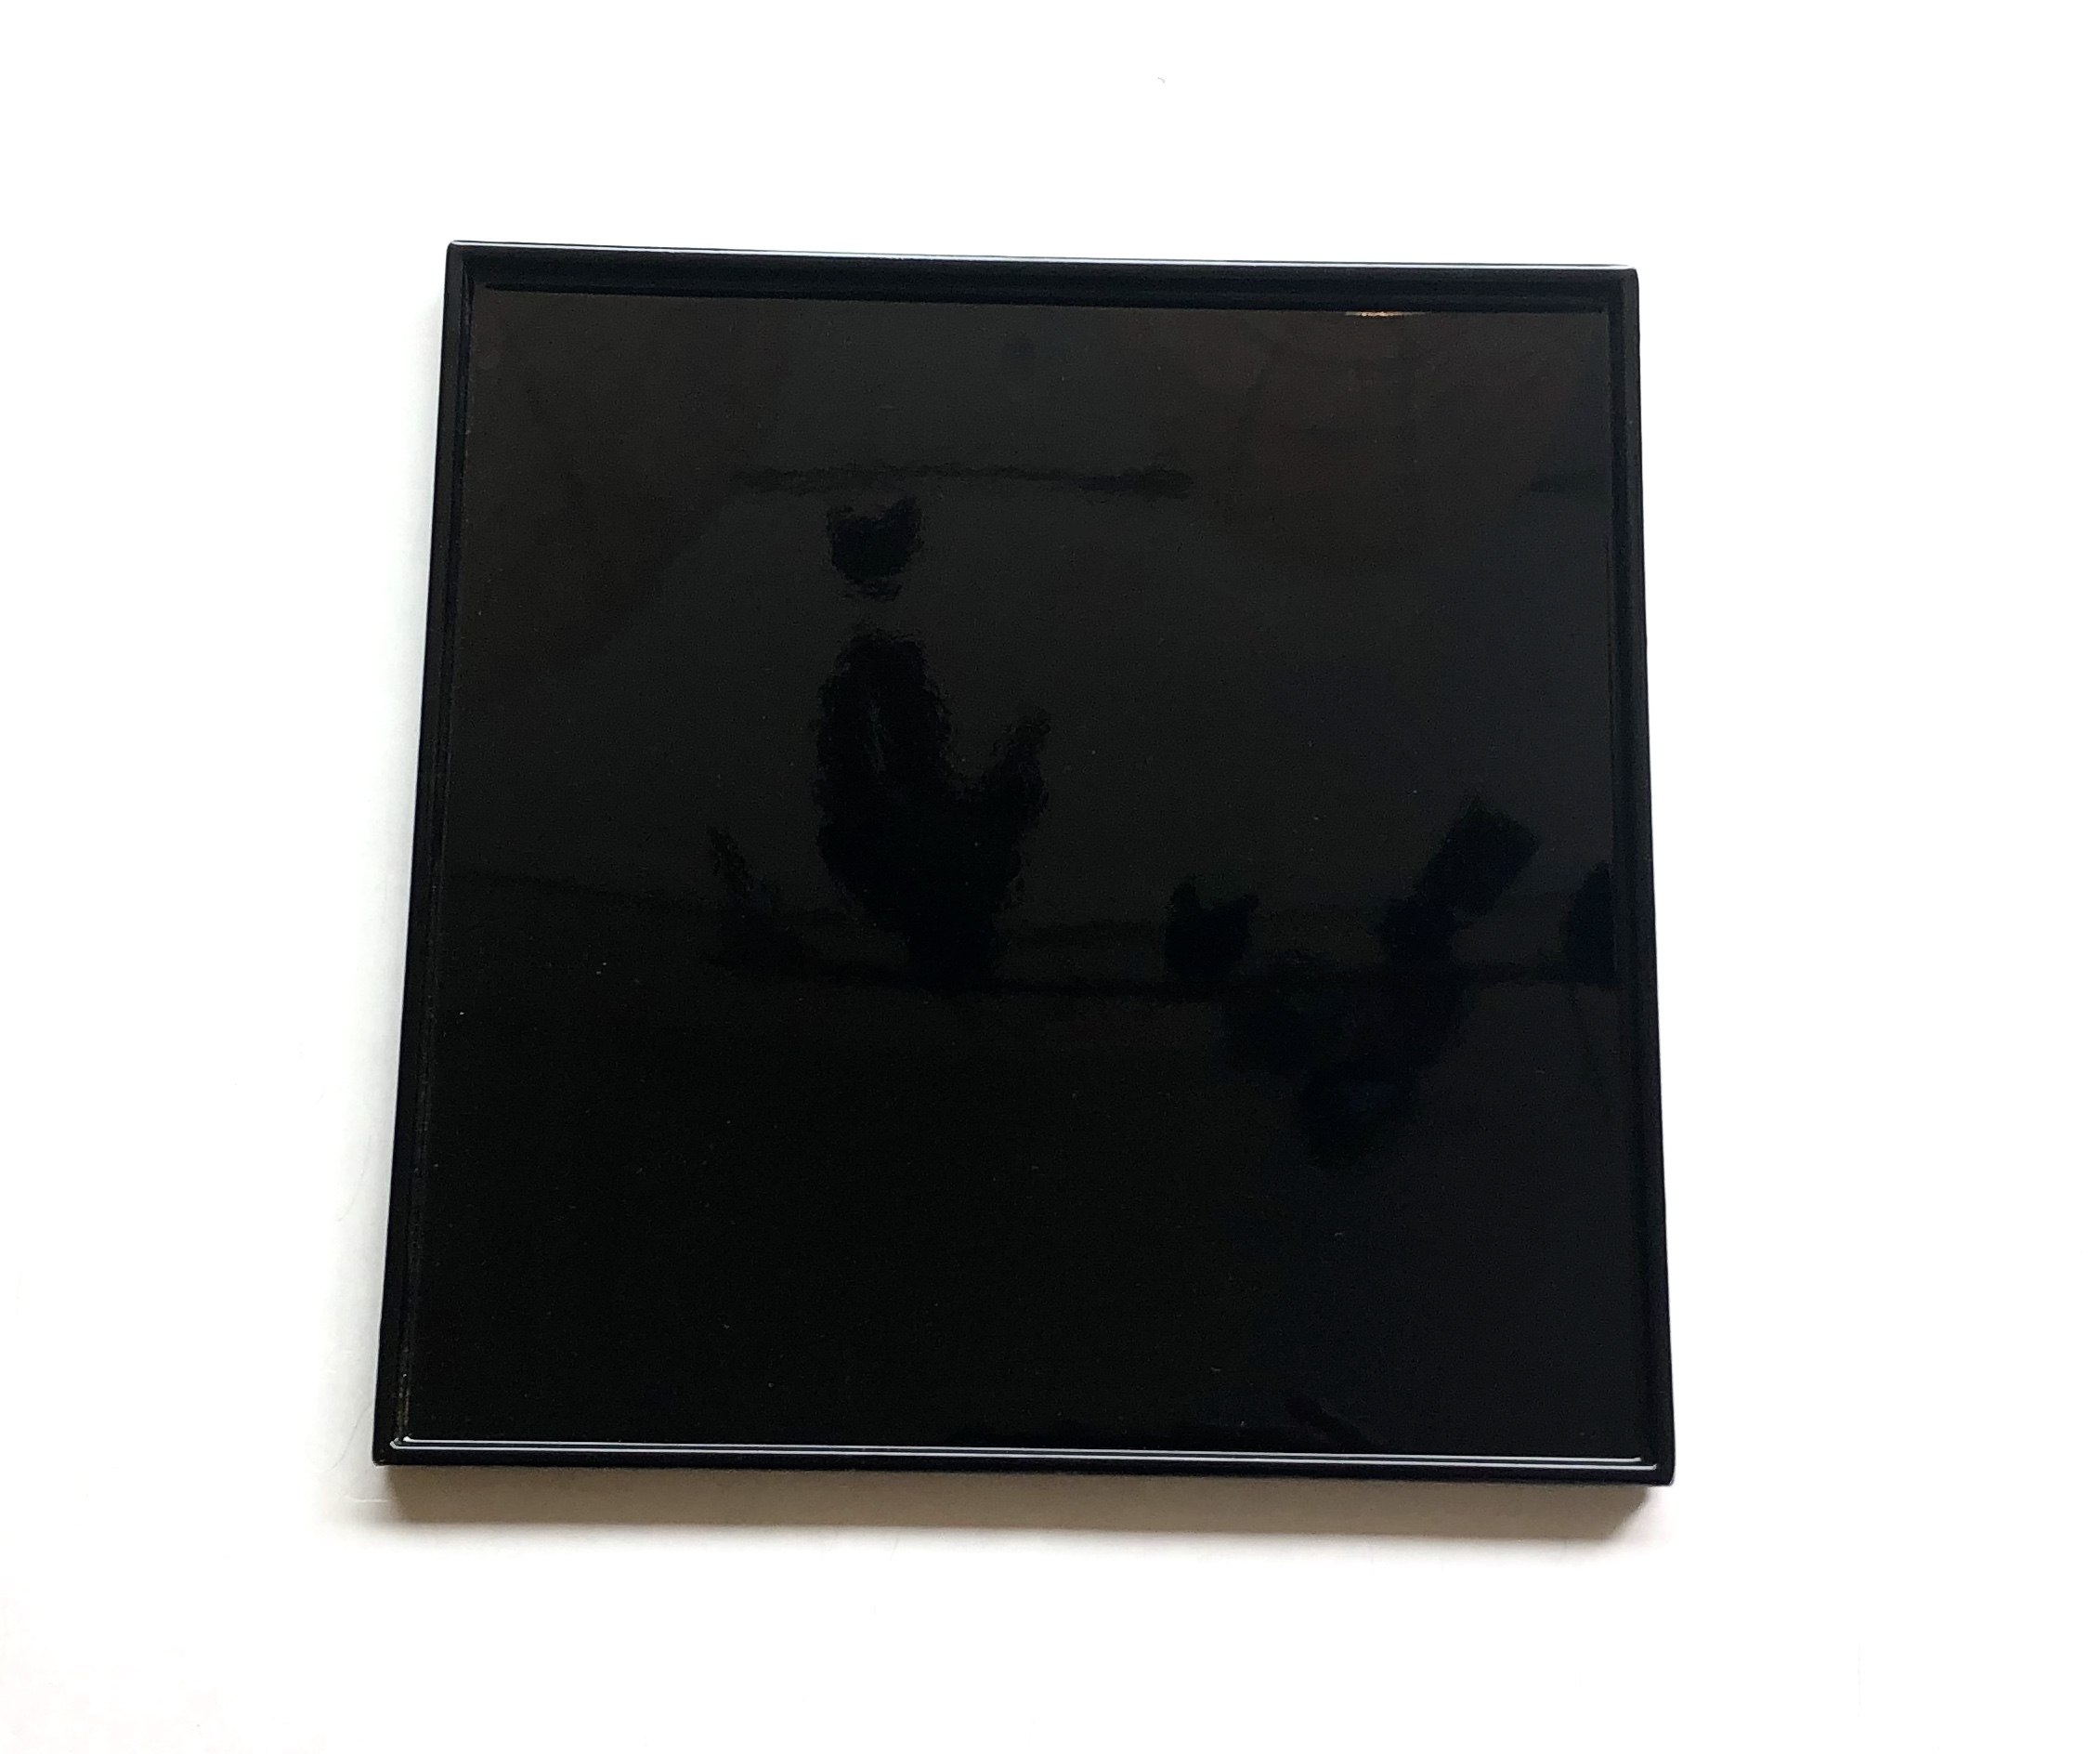 Tablett,Lack, schwarz 30 cm x 30 cm